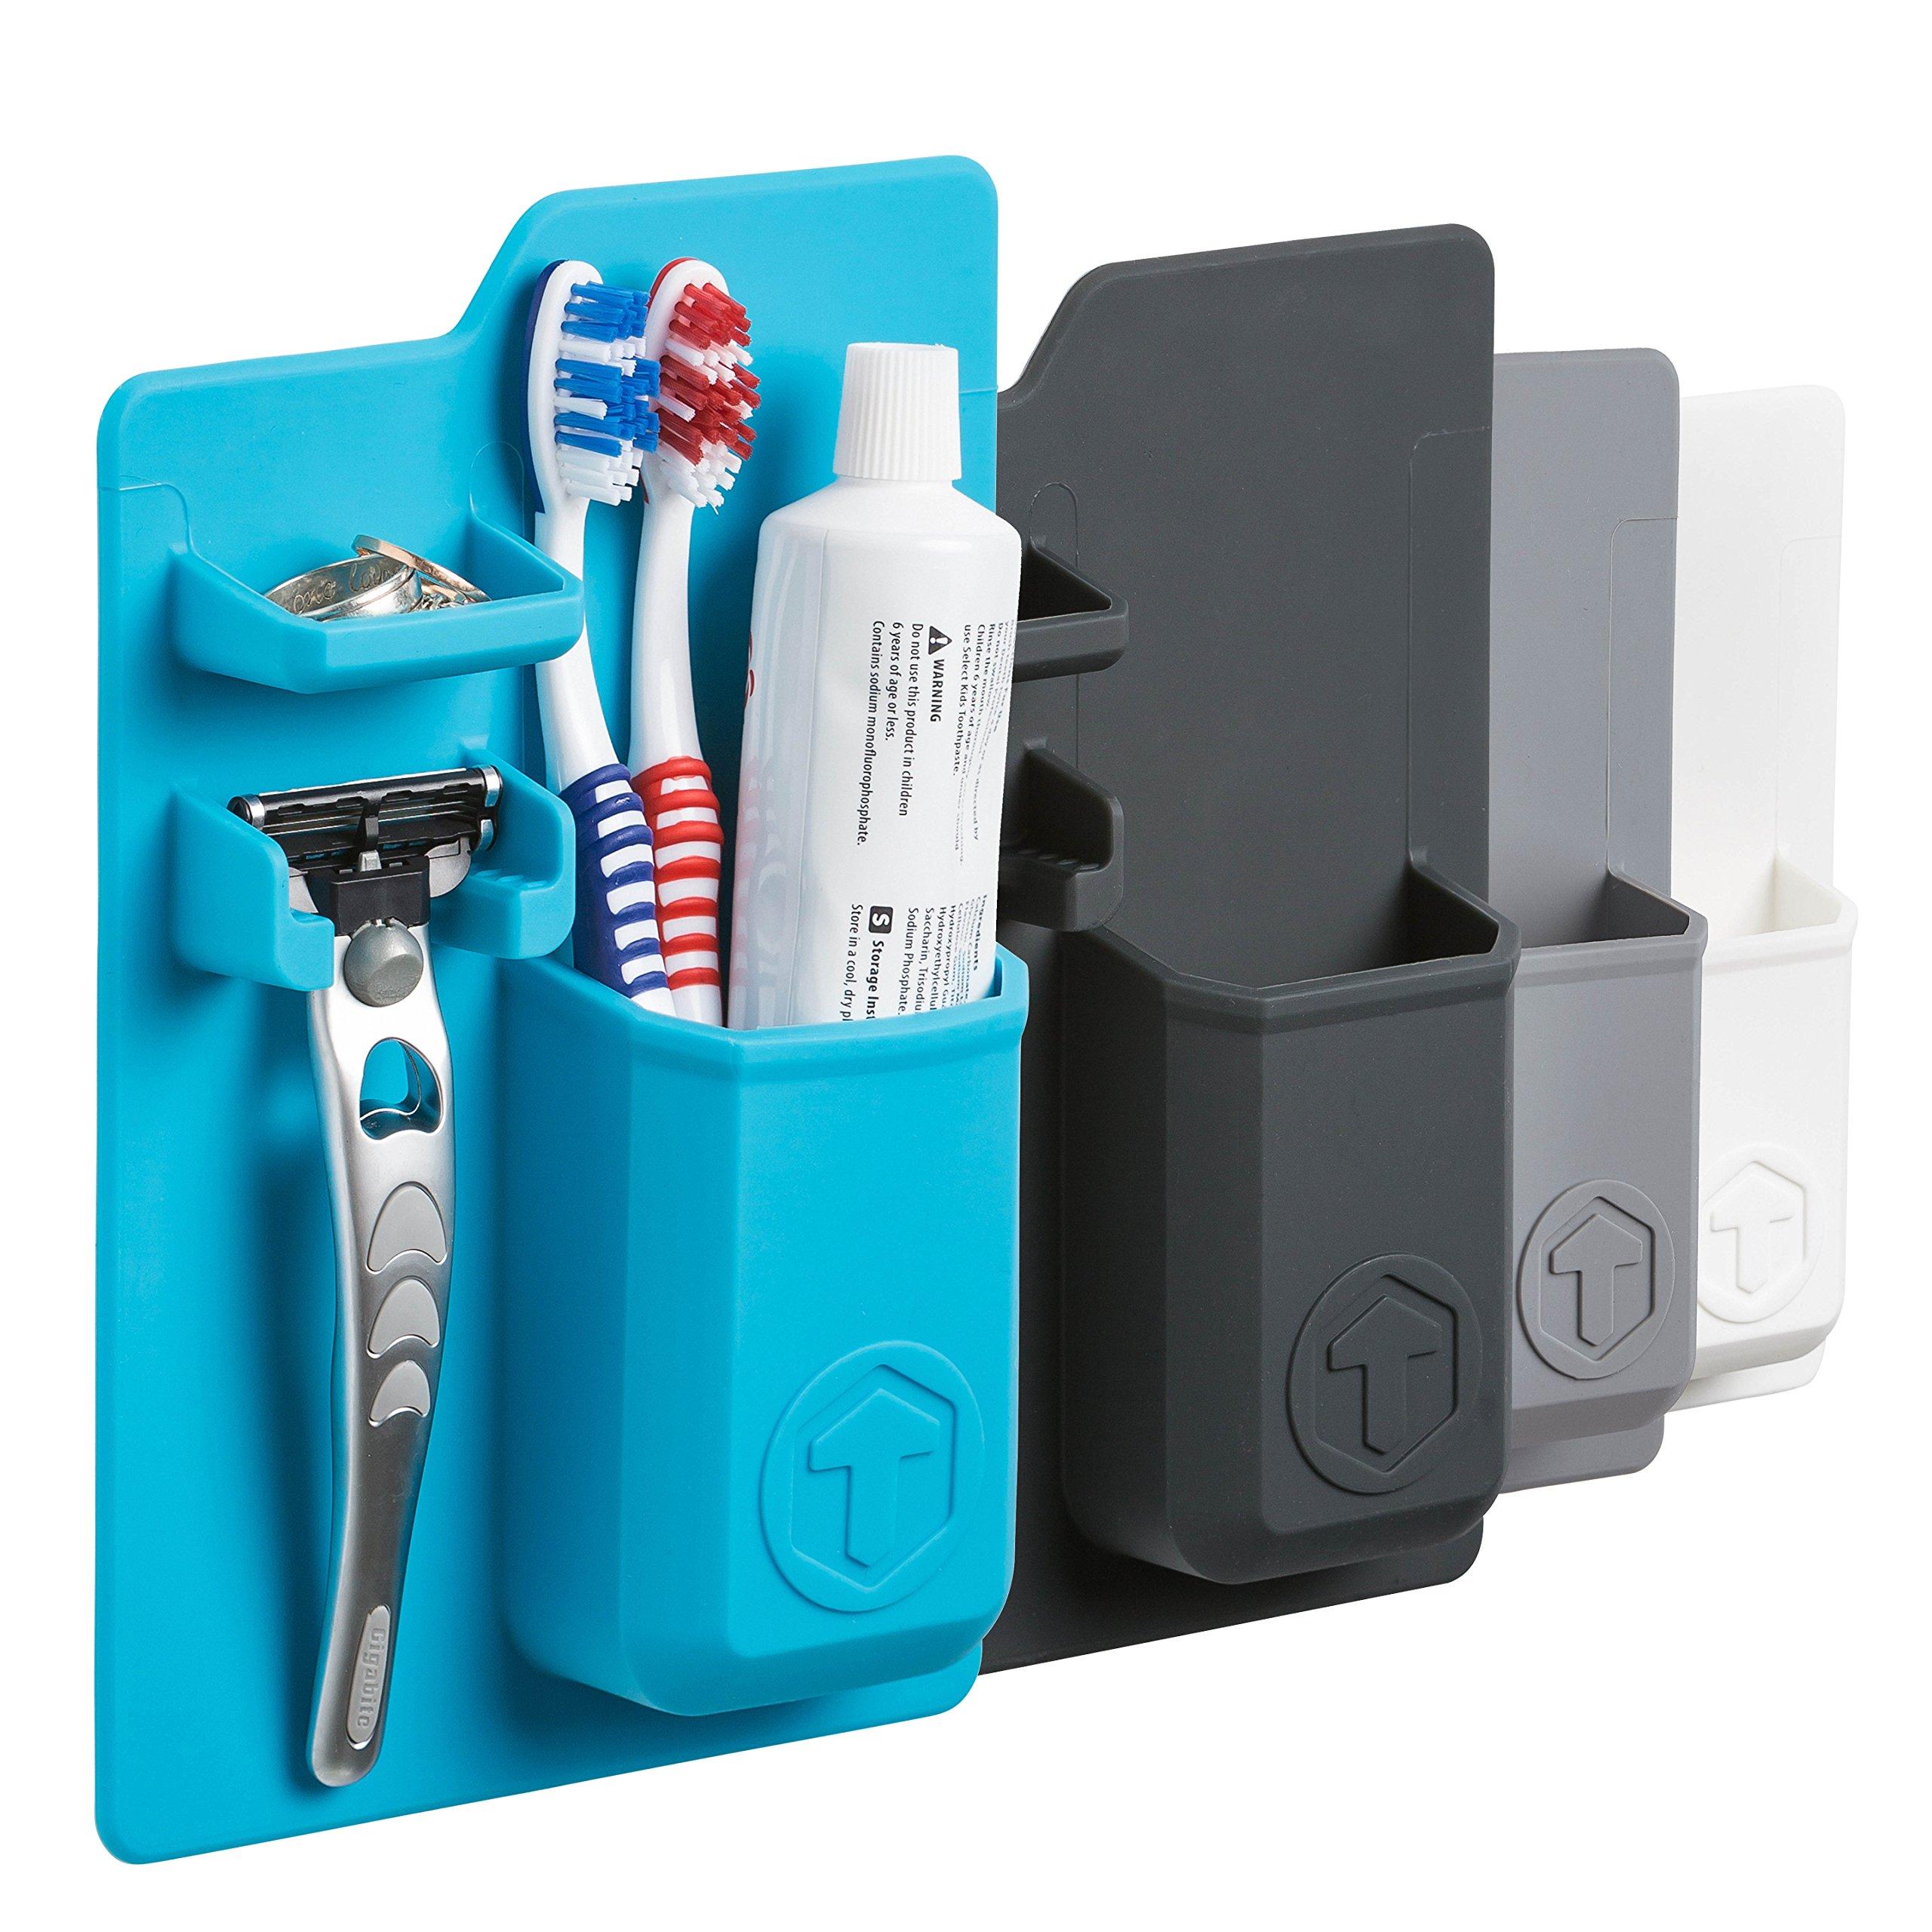 iDLEHANDS Silicone Toothbrush Holder - Bathroom Storage Organizer ...